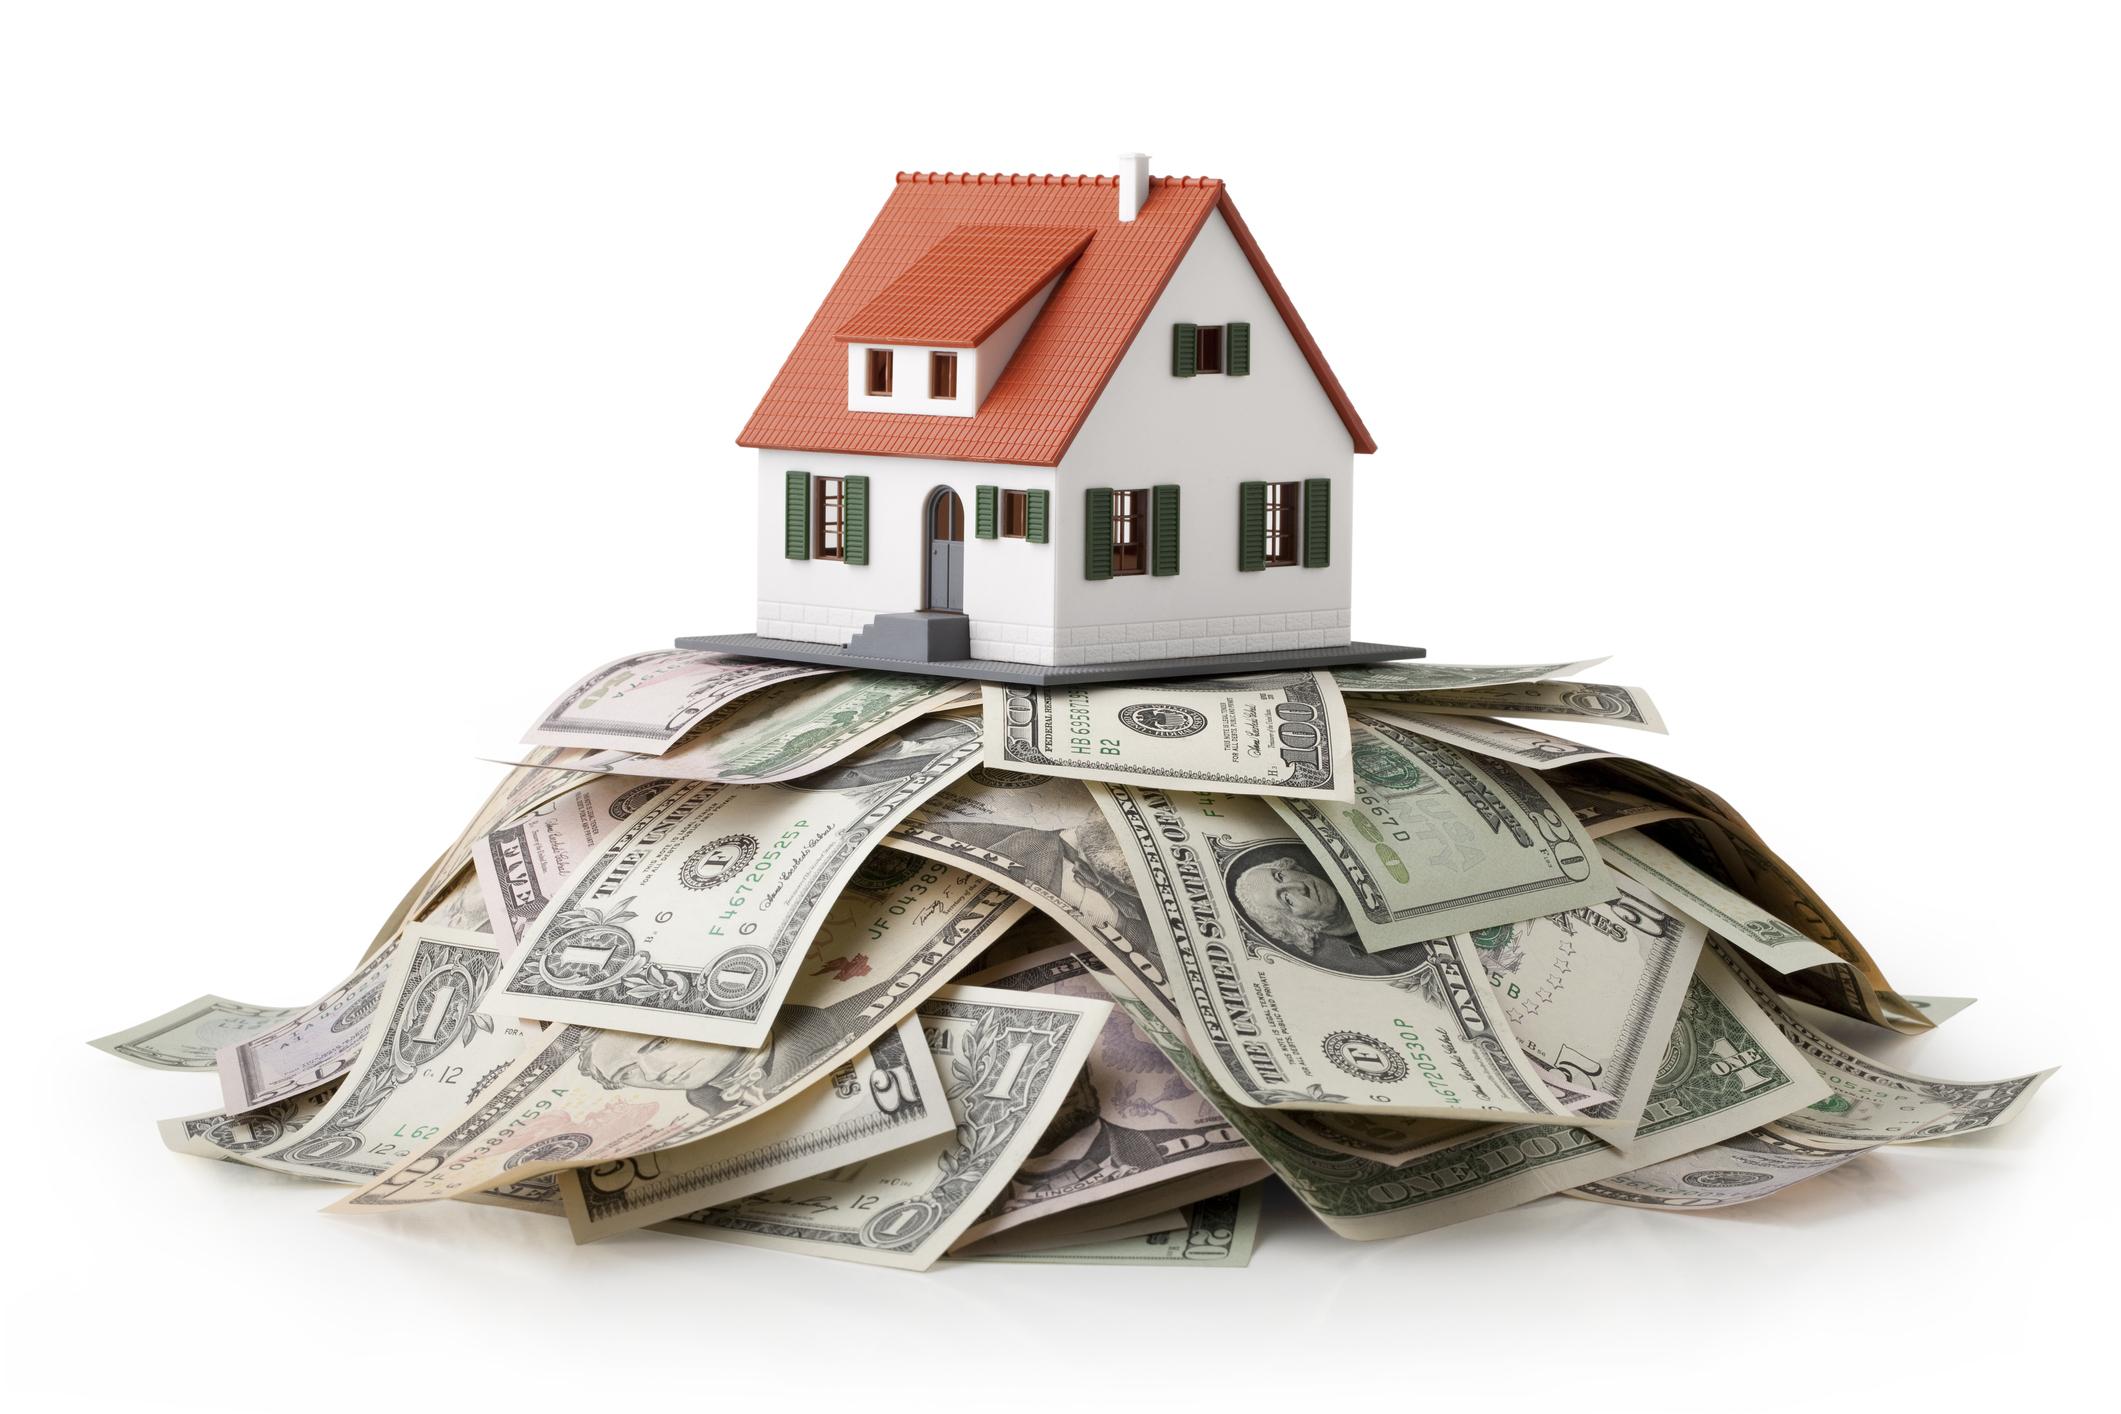 3 Ways to Take Advantage of Home Equity | Achieva Life